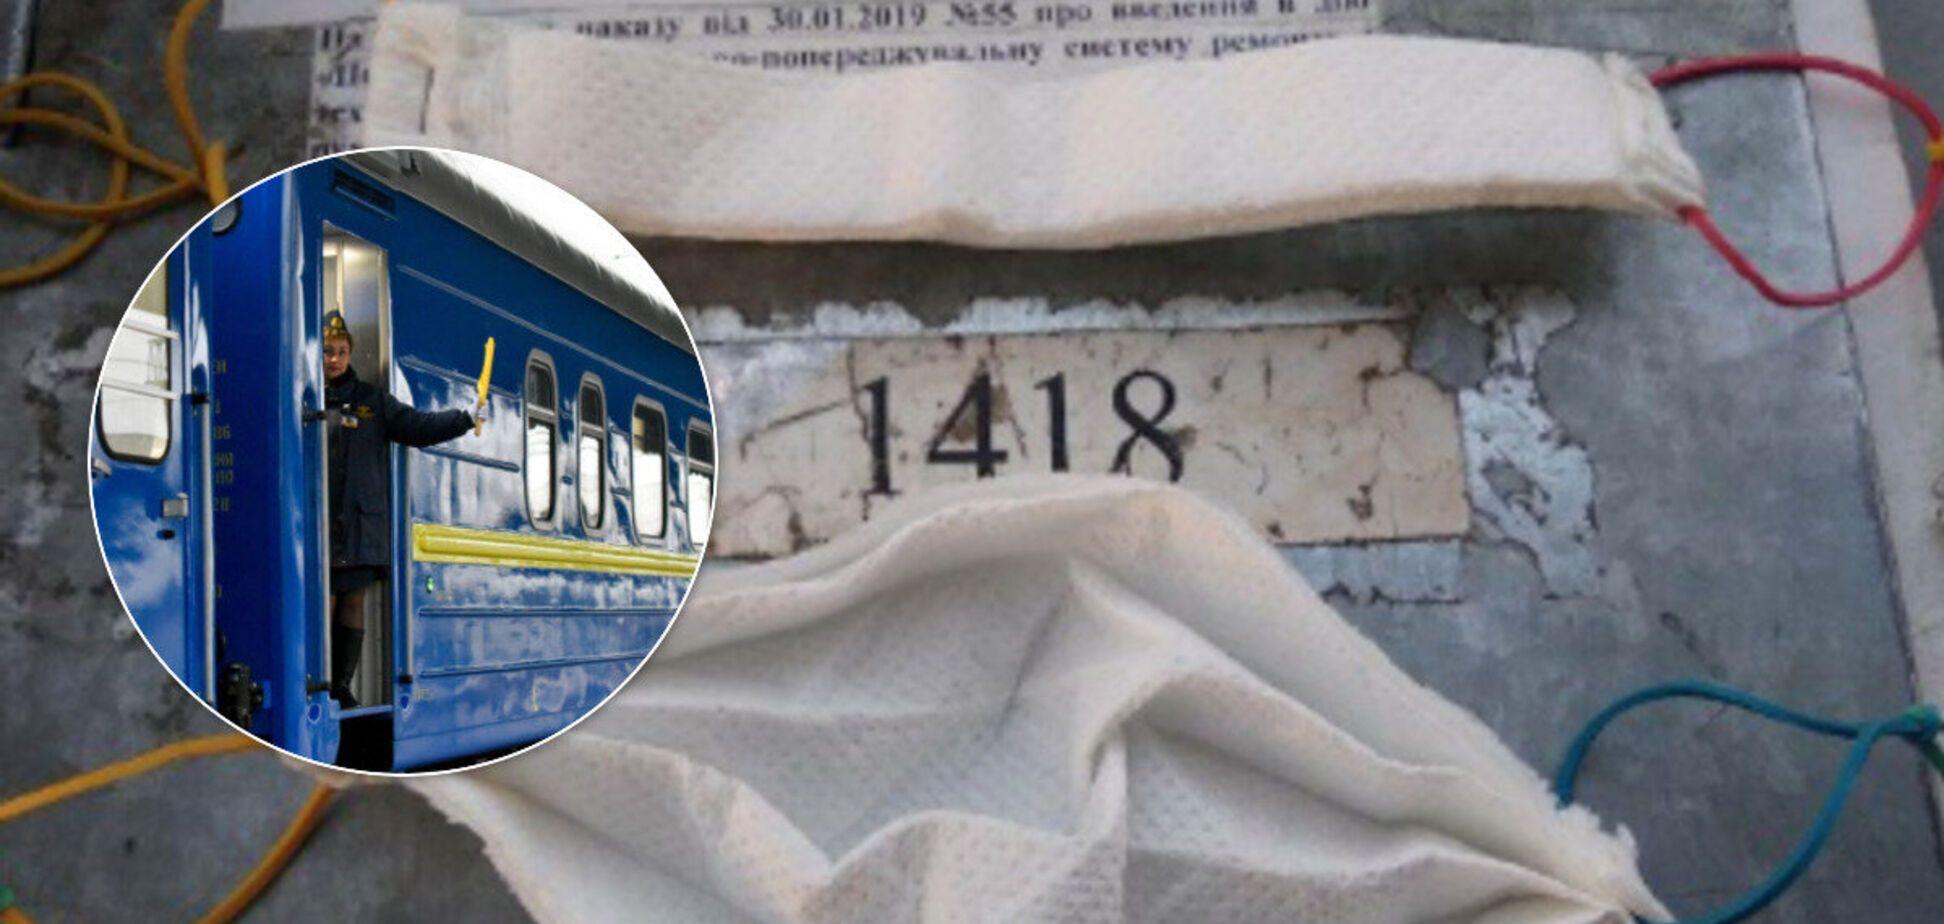 Врача разозлили маски из салфеток в 'Укрзалізниці': скандал получил продолжение